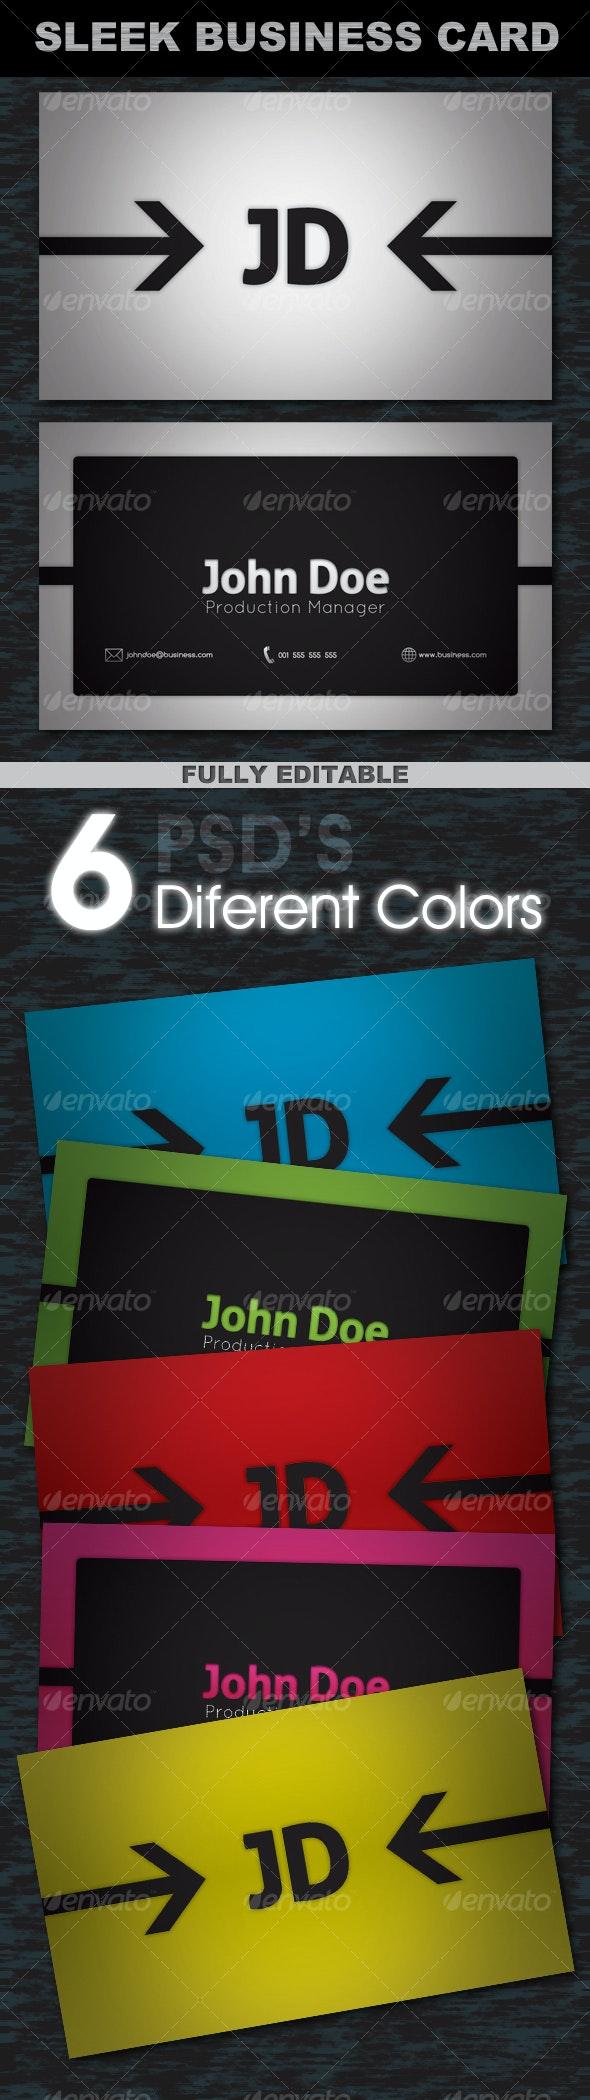 Sleek Business Card - 6 Diferent Colors - Creative Business Cards